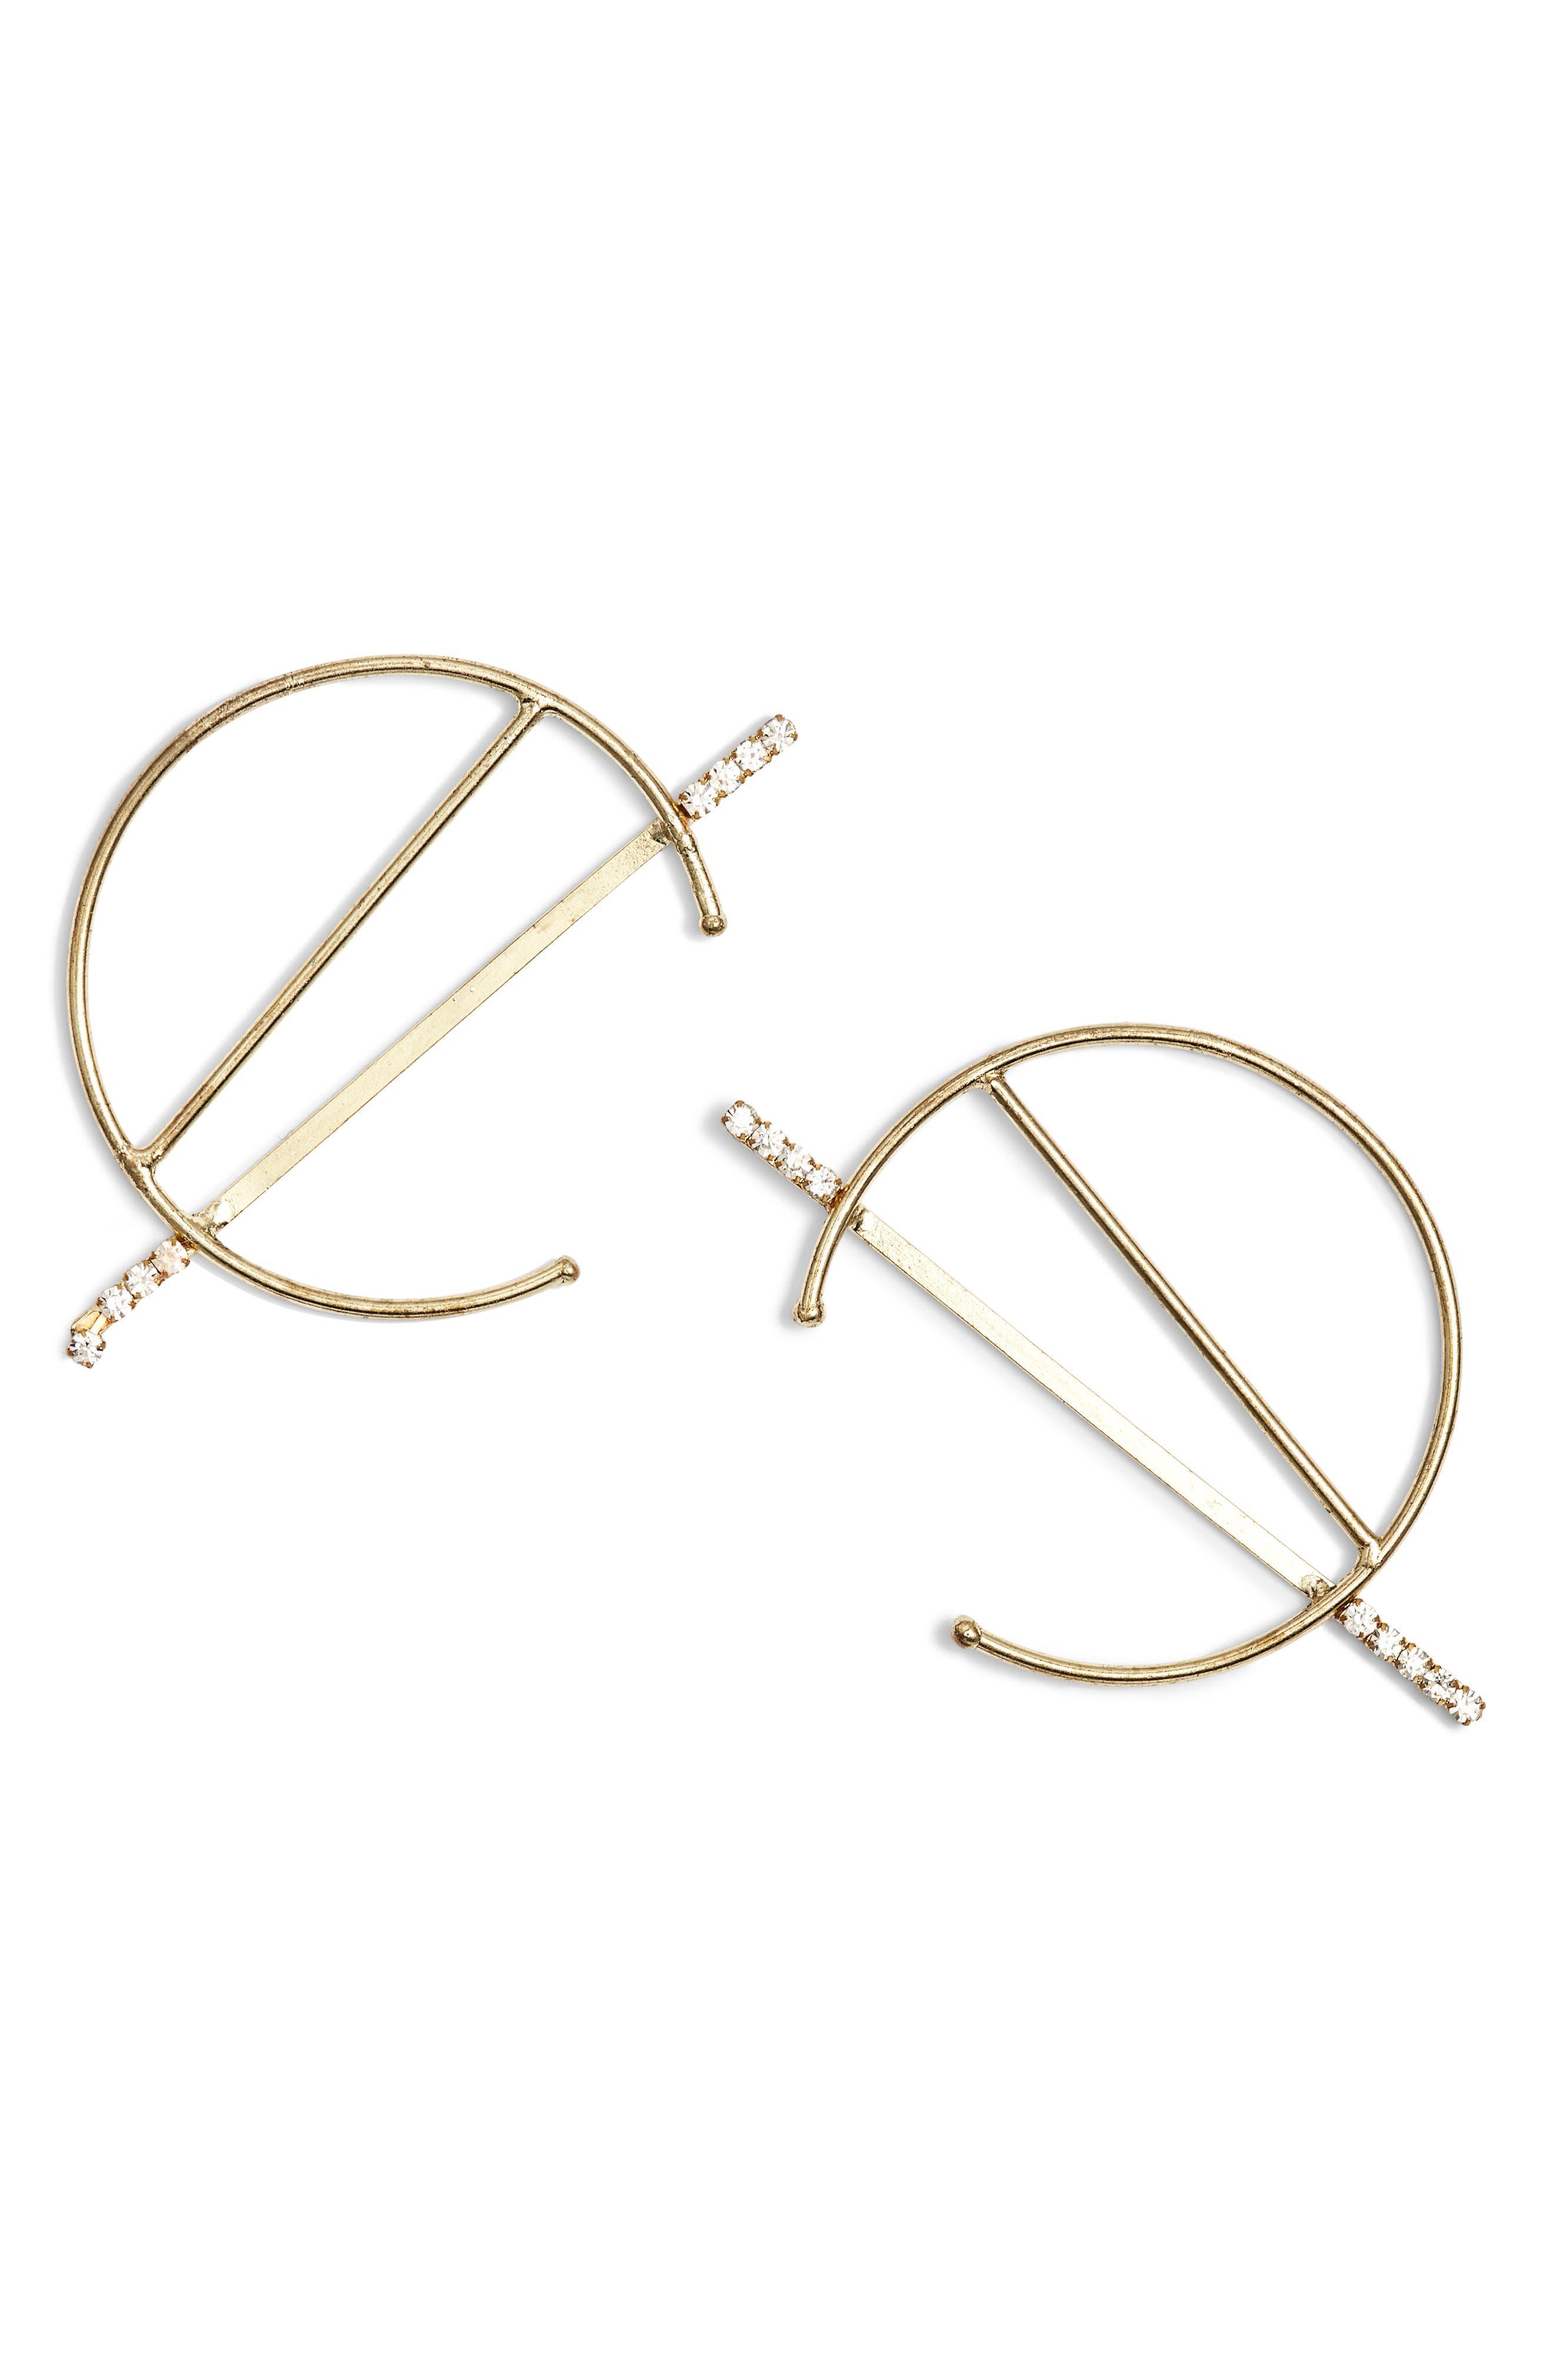 AREA STARS Danielle Circle & Bar Earrings in Gold